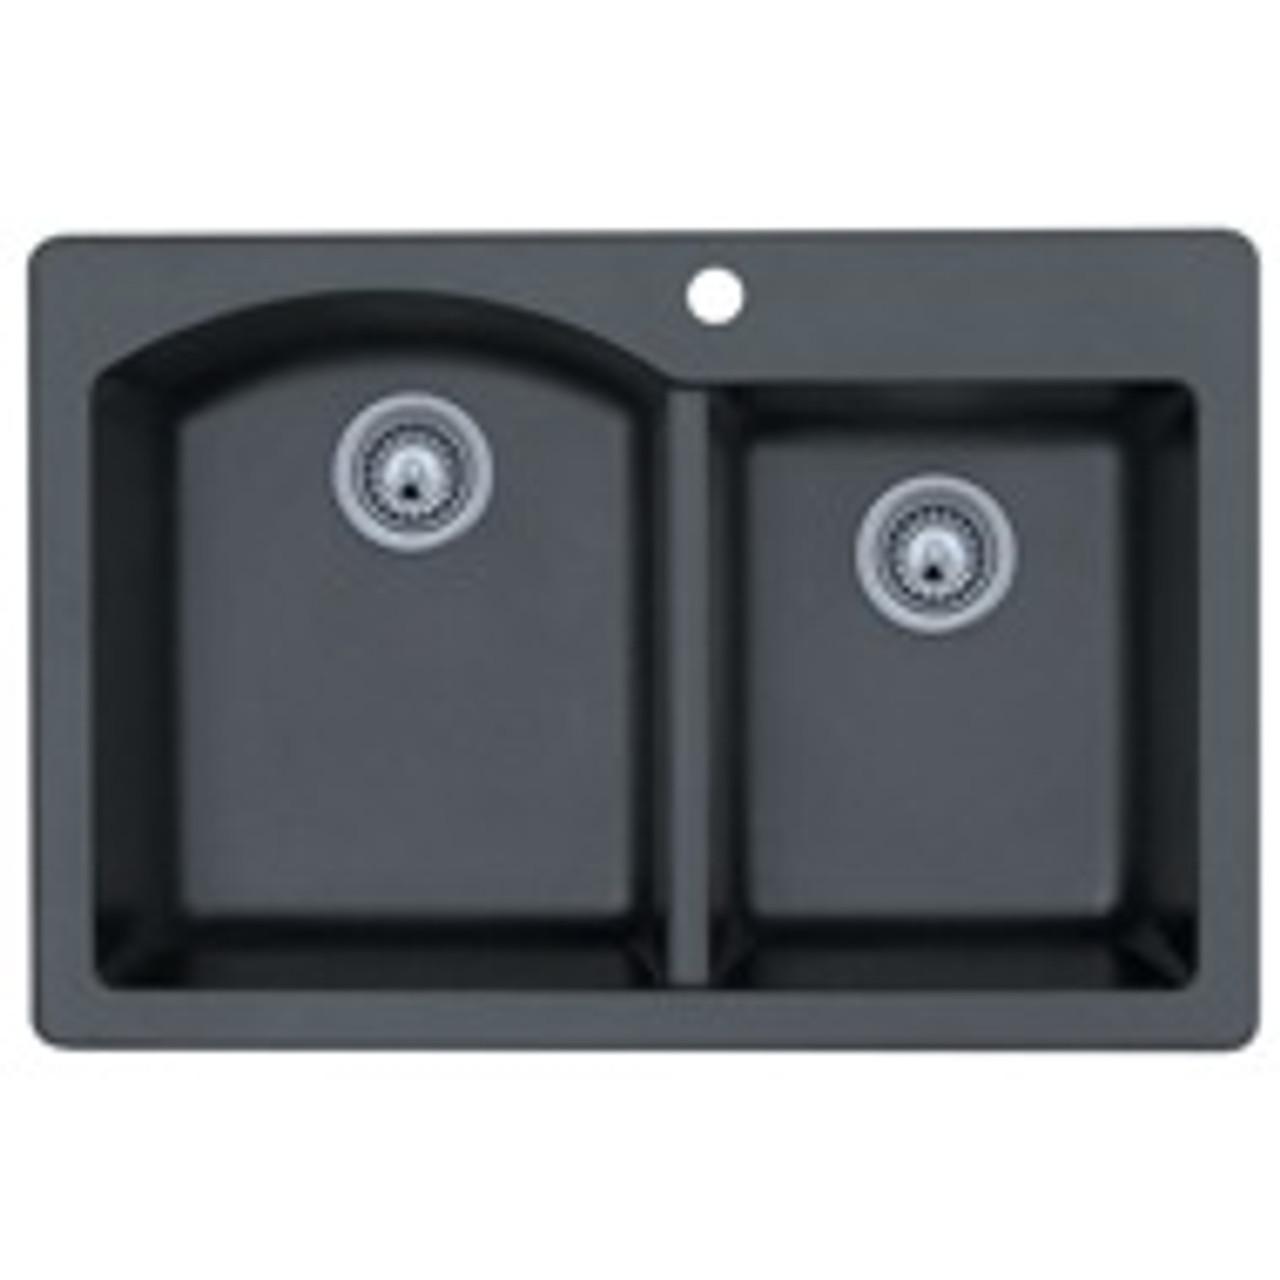 16 L x 18 H x 7.5 H Granito Swanstone QZBS-1816.076 Granite Dual Mount Single-Bowl Kitchen Sink